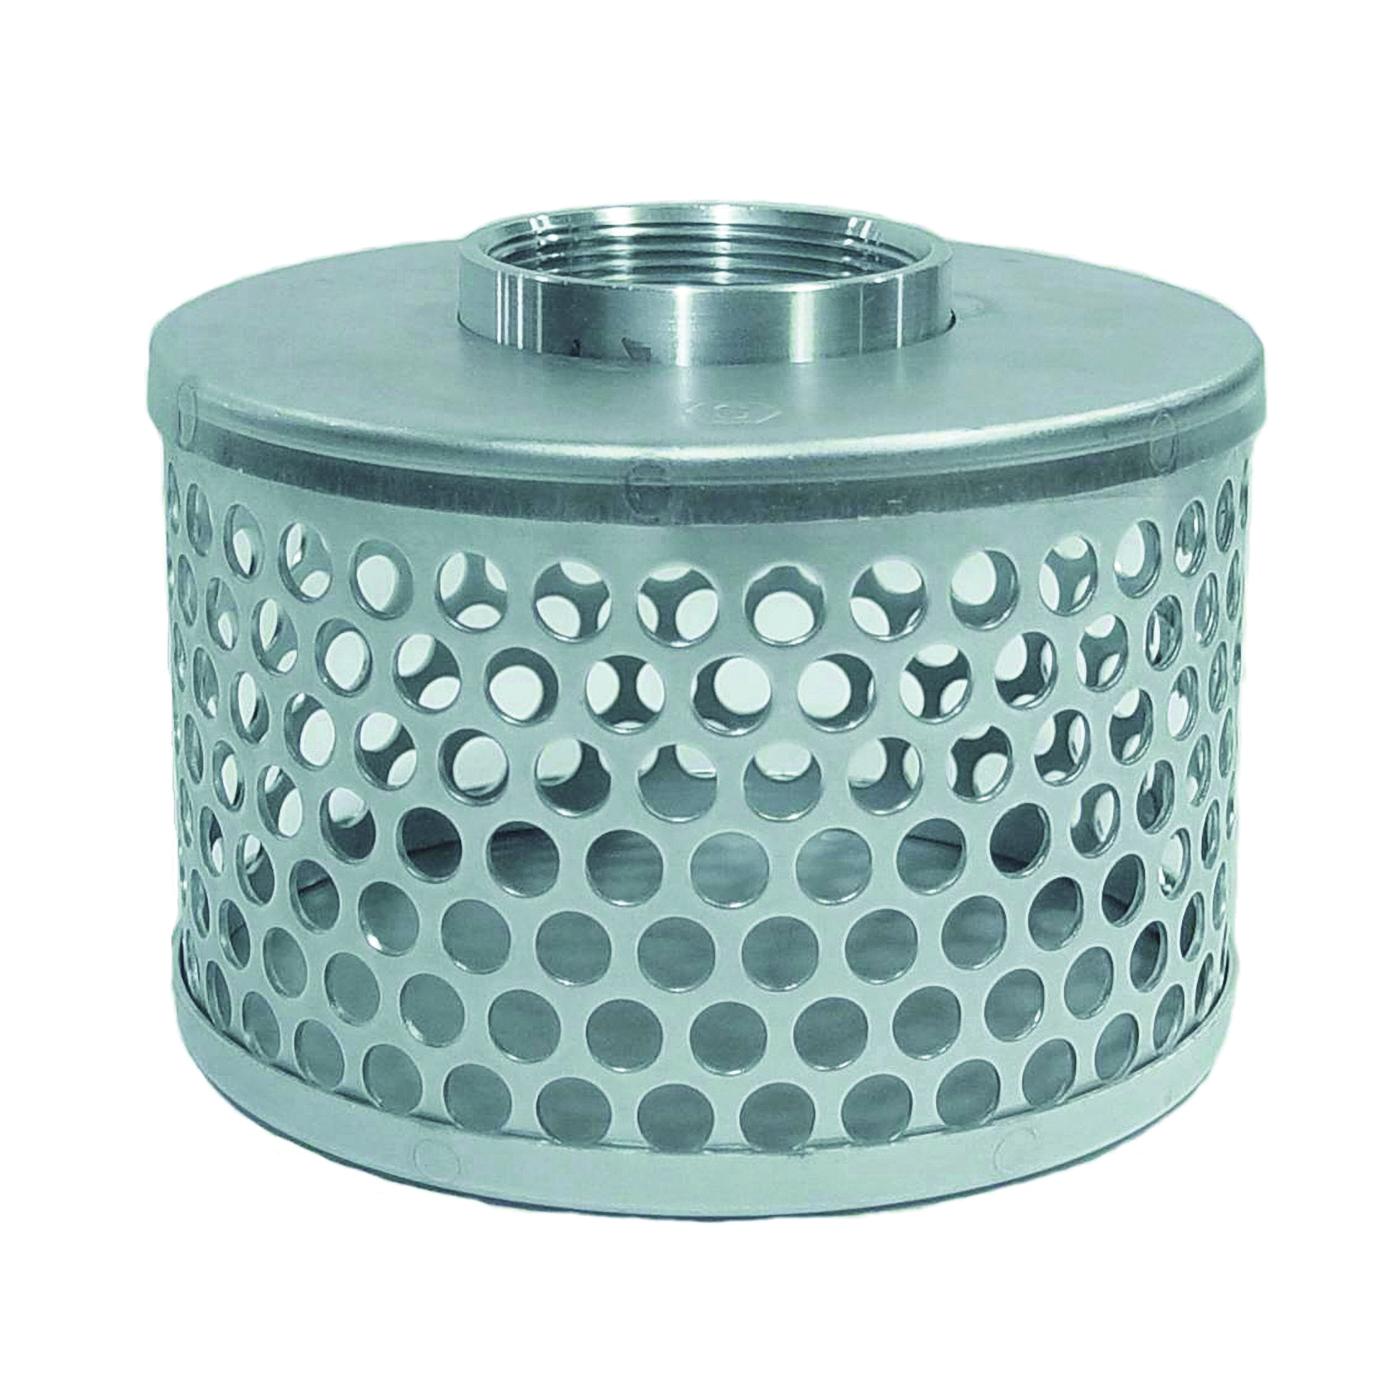 Picture of ABBOTT RUBBER SRHS-200 Hose Strainer, Steel, For: Pump Suction Hose